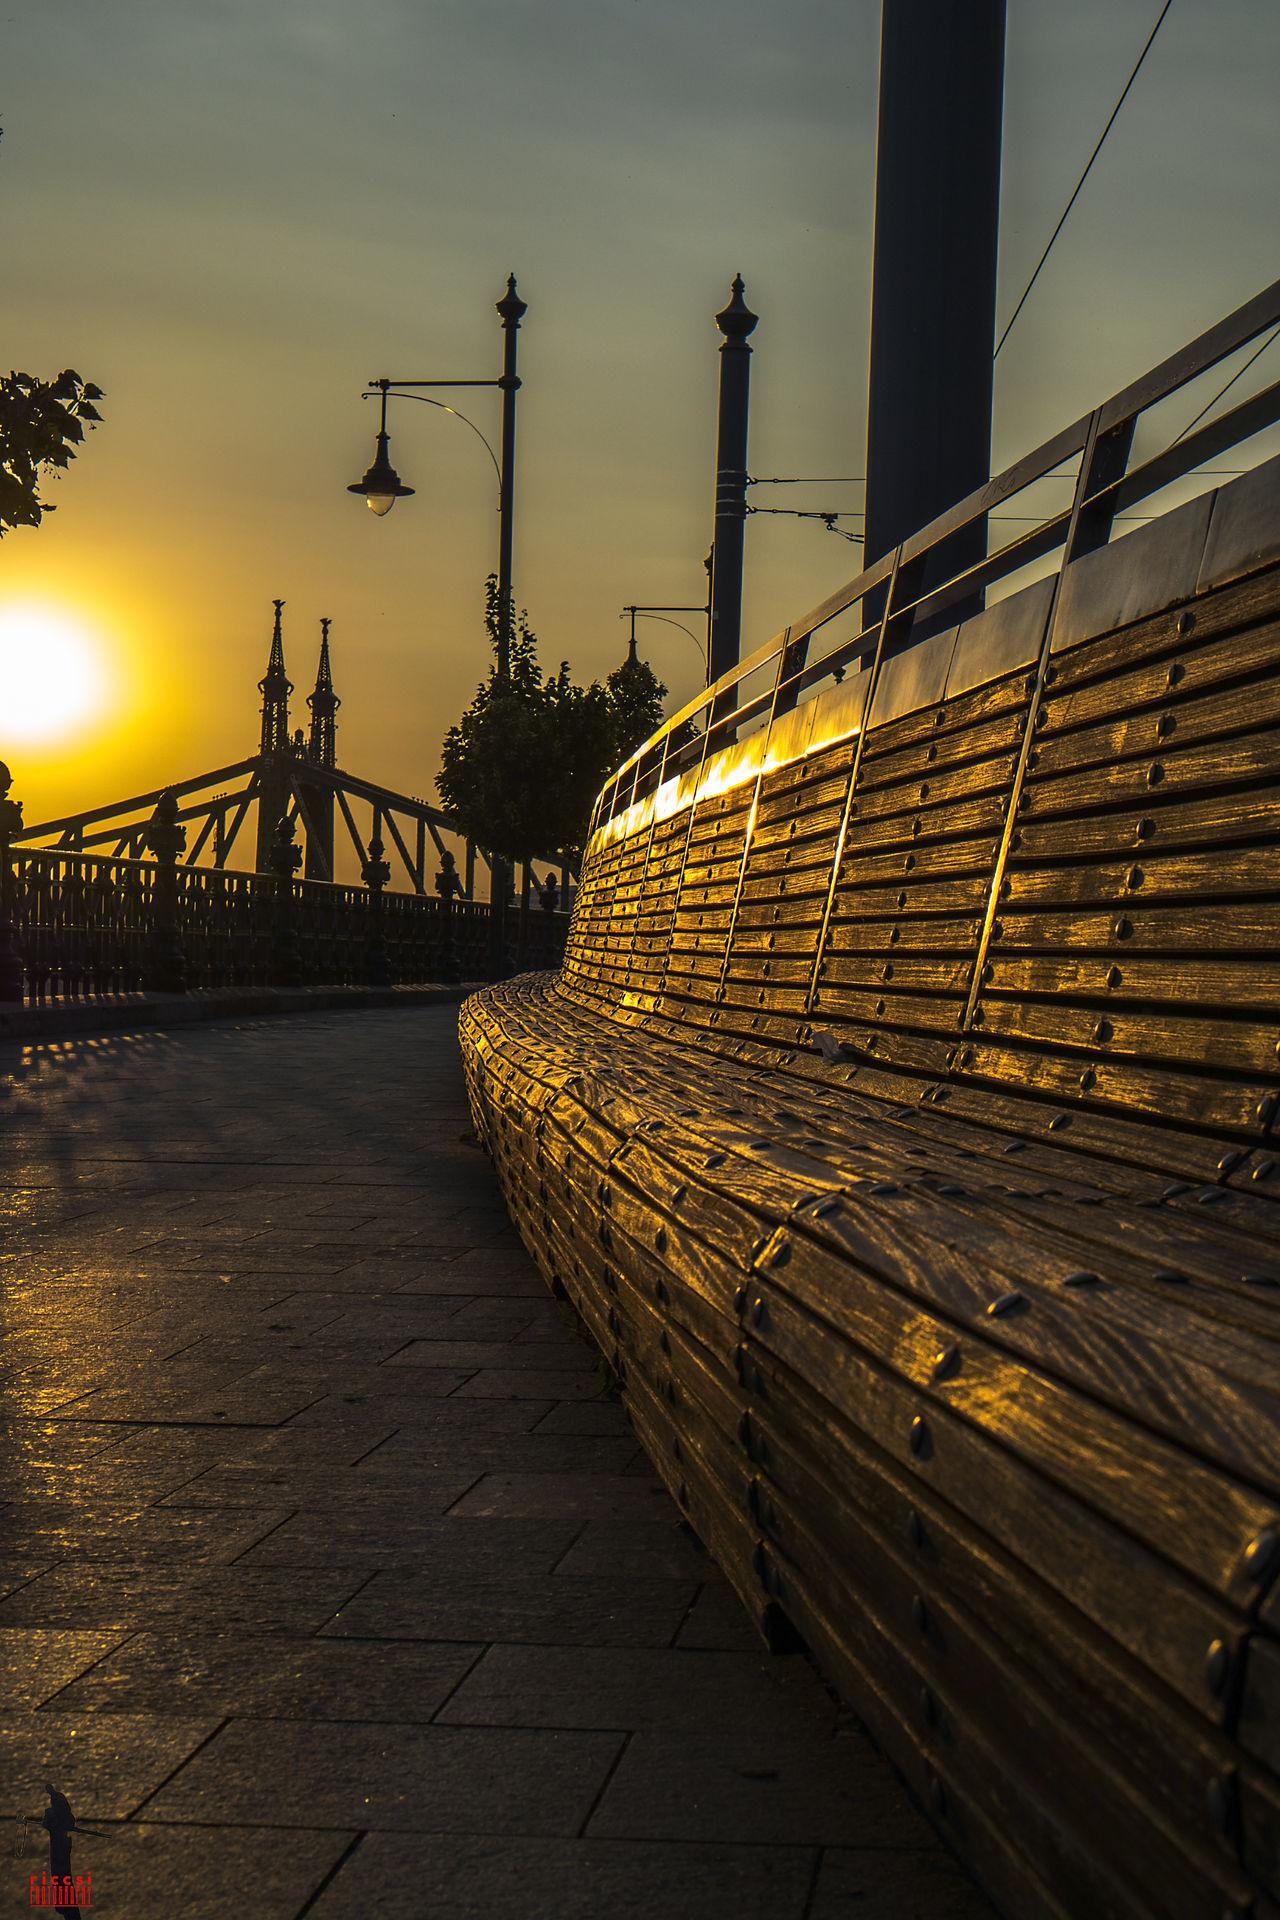 Still Bench Bench Bridge Bridge - Man Made Structure Budapest Dawn Eu Europe Evening Goldenhour GoldenHours Hungary Light Light And Shadow Riccsi River Silhouette Summer Sunset Wood Yelloq